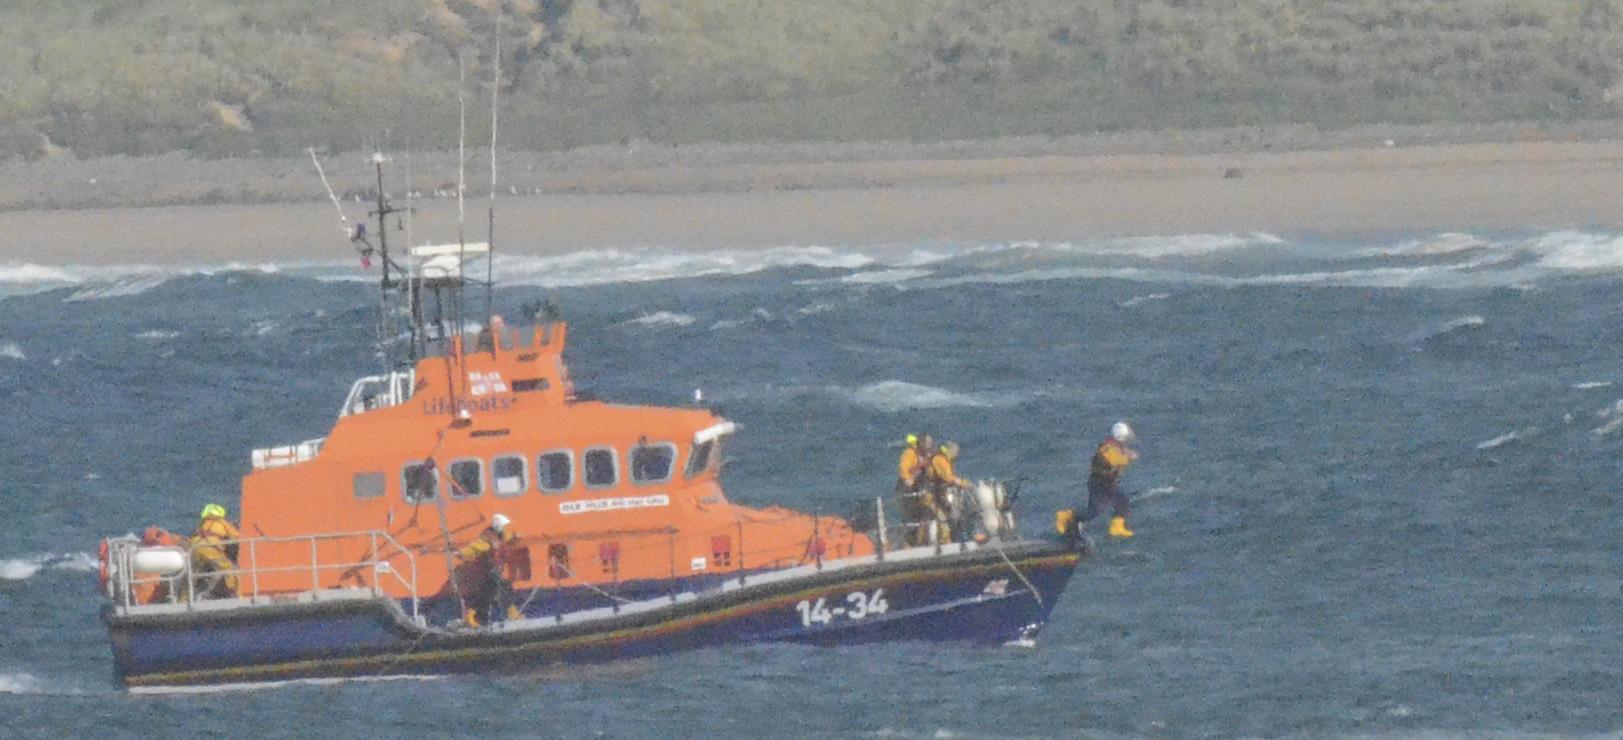 Volunteer crew members jumps in to save child